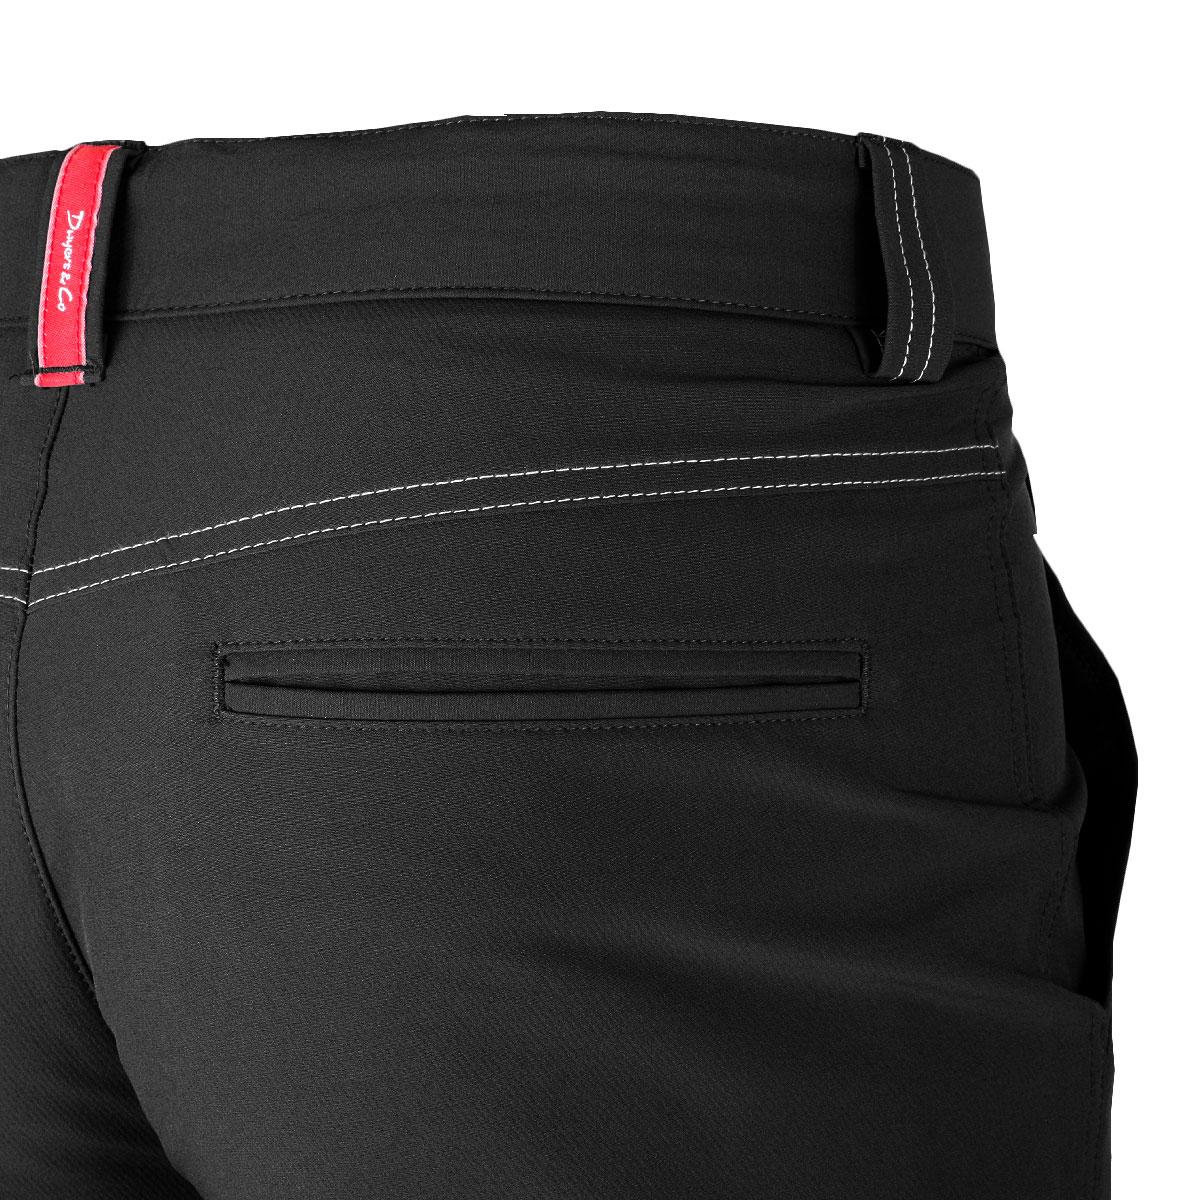 Dwyers-amp-Co-Mens-Golf-Trousers-Micro-Tech-Pant-43-OFF-RRP thumbnail 5